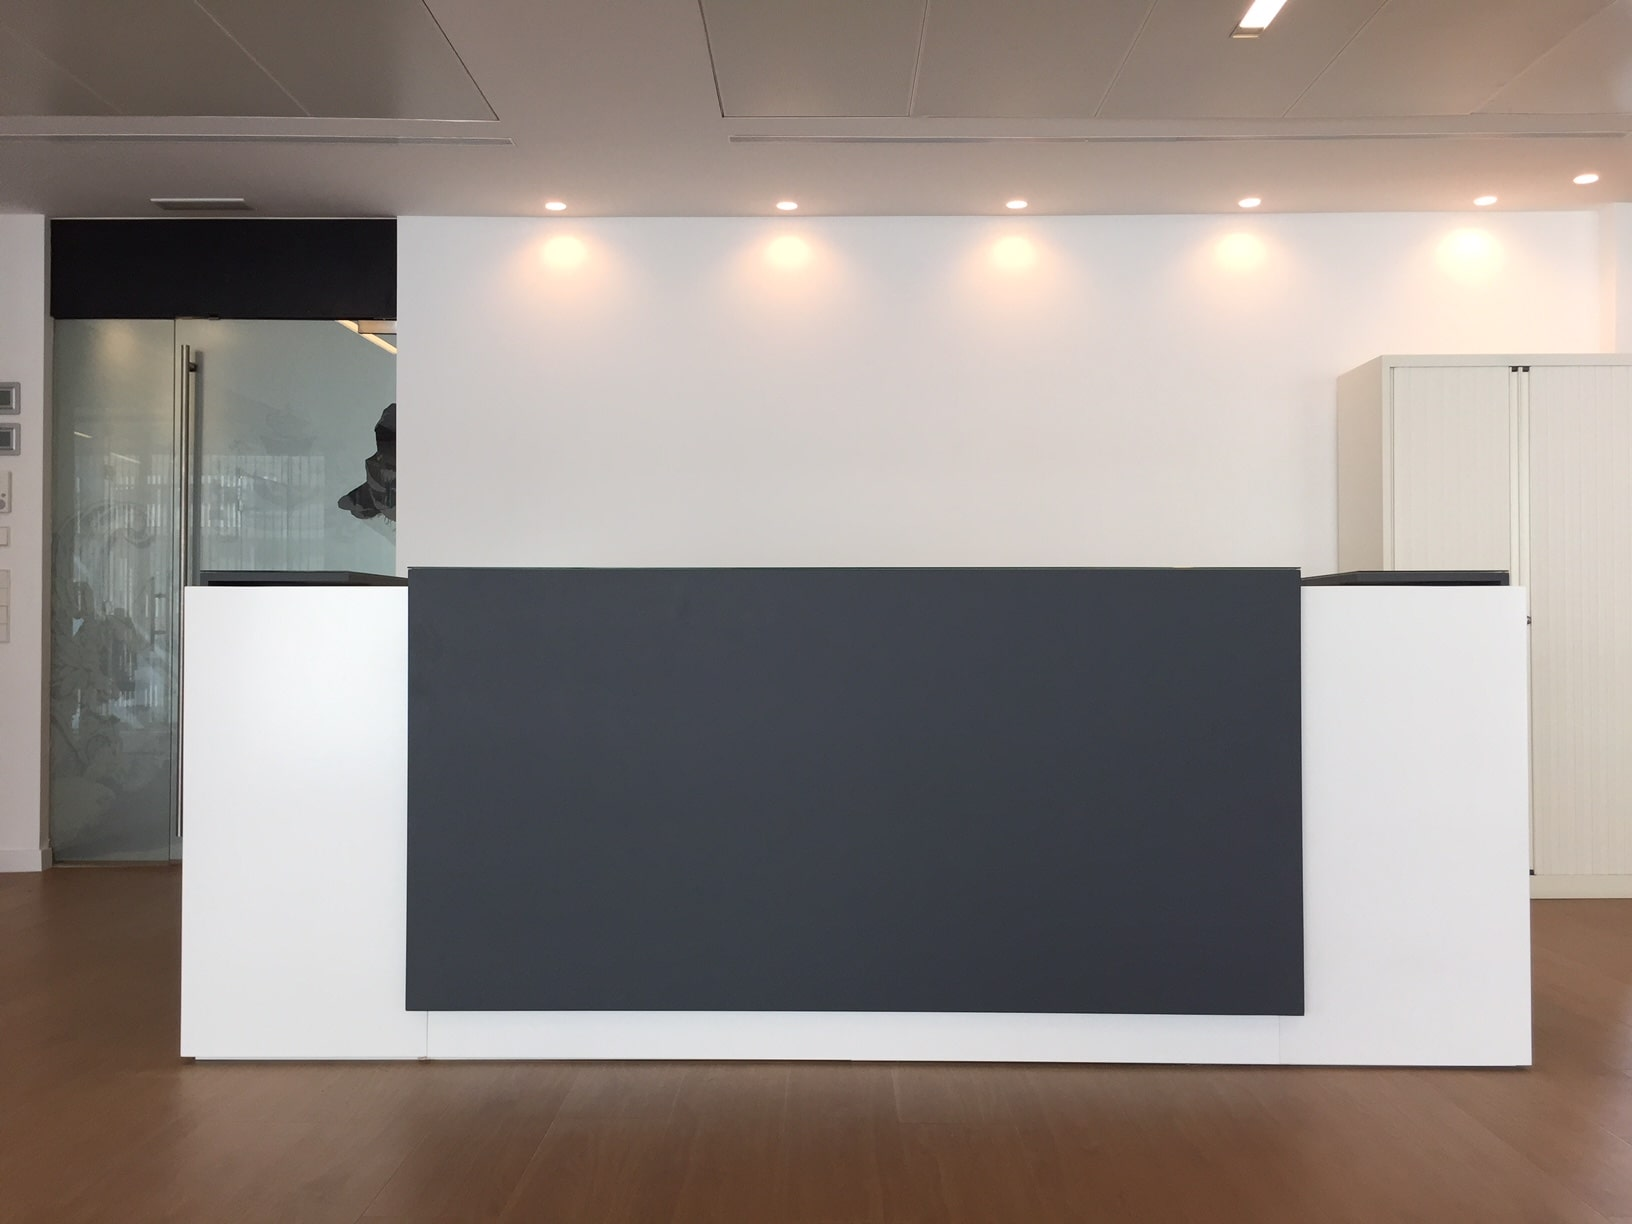 Mobiliario para empresas según diseño